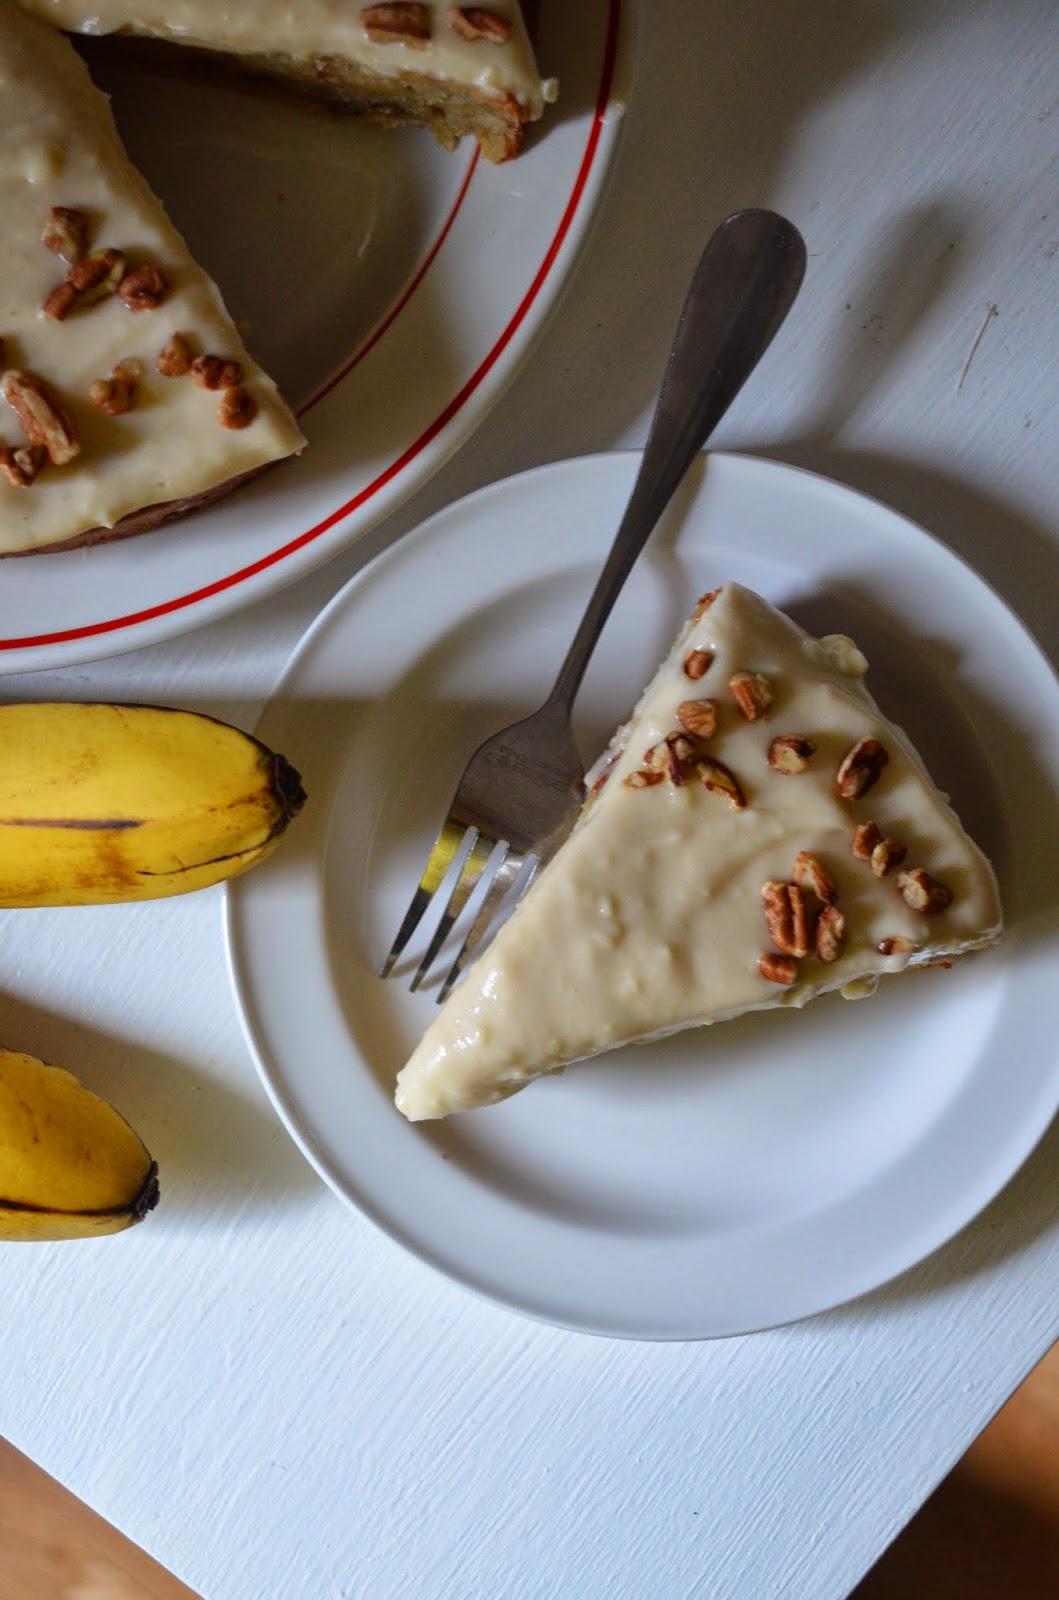 Banana Cake Without Electric Mixer